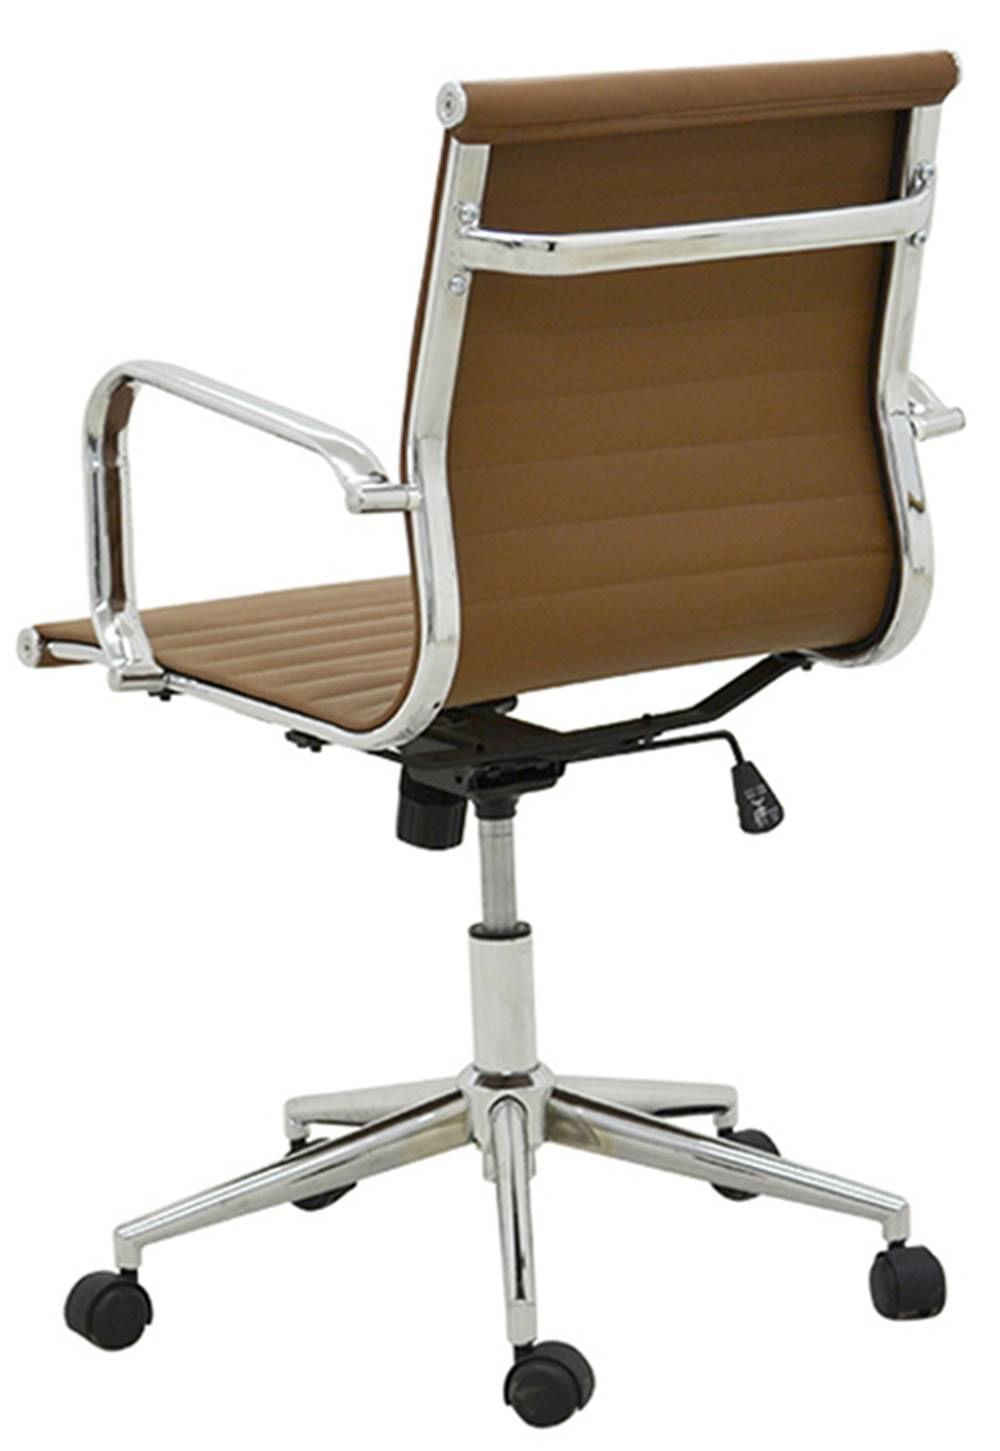 Cadeira Sevilha Eames Baixa Cromada PU Marrom Escuro - 37792